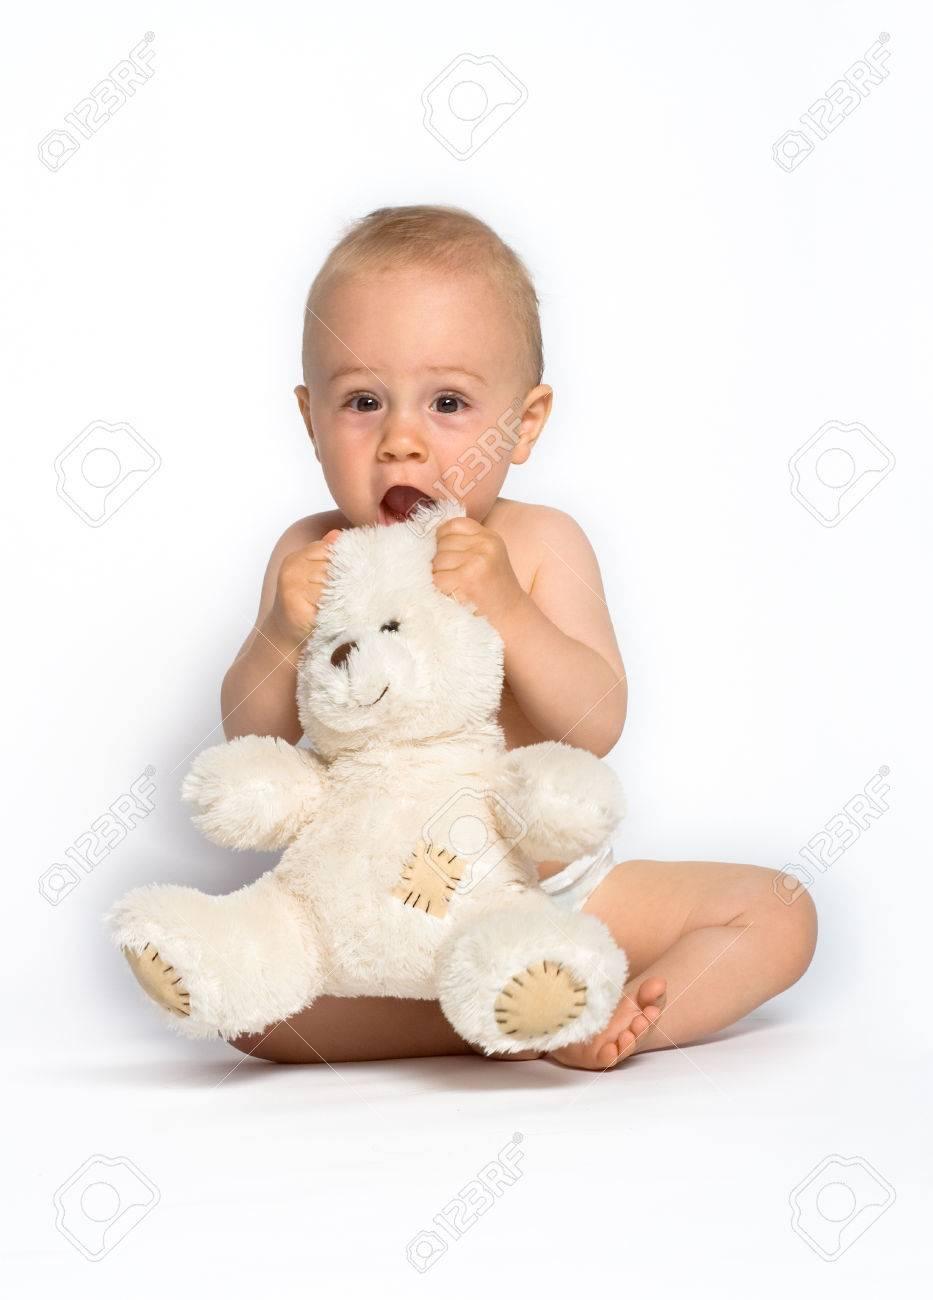 Cute little boy holding a white, stuffed teddy bear. White background. Stock Photo - 1677664